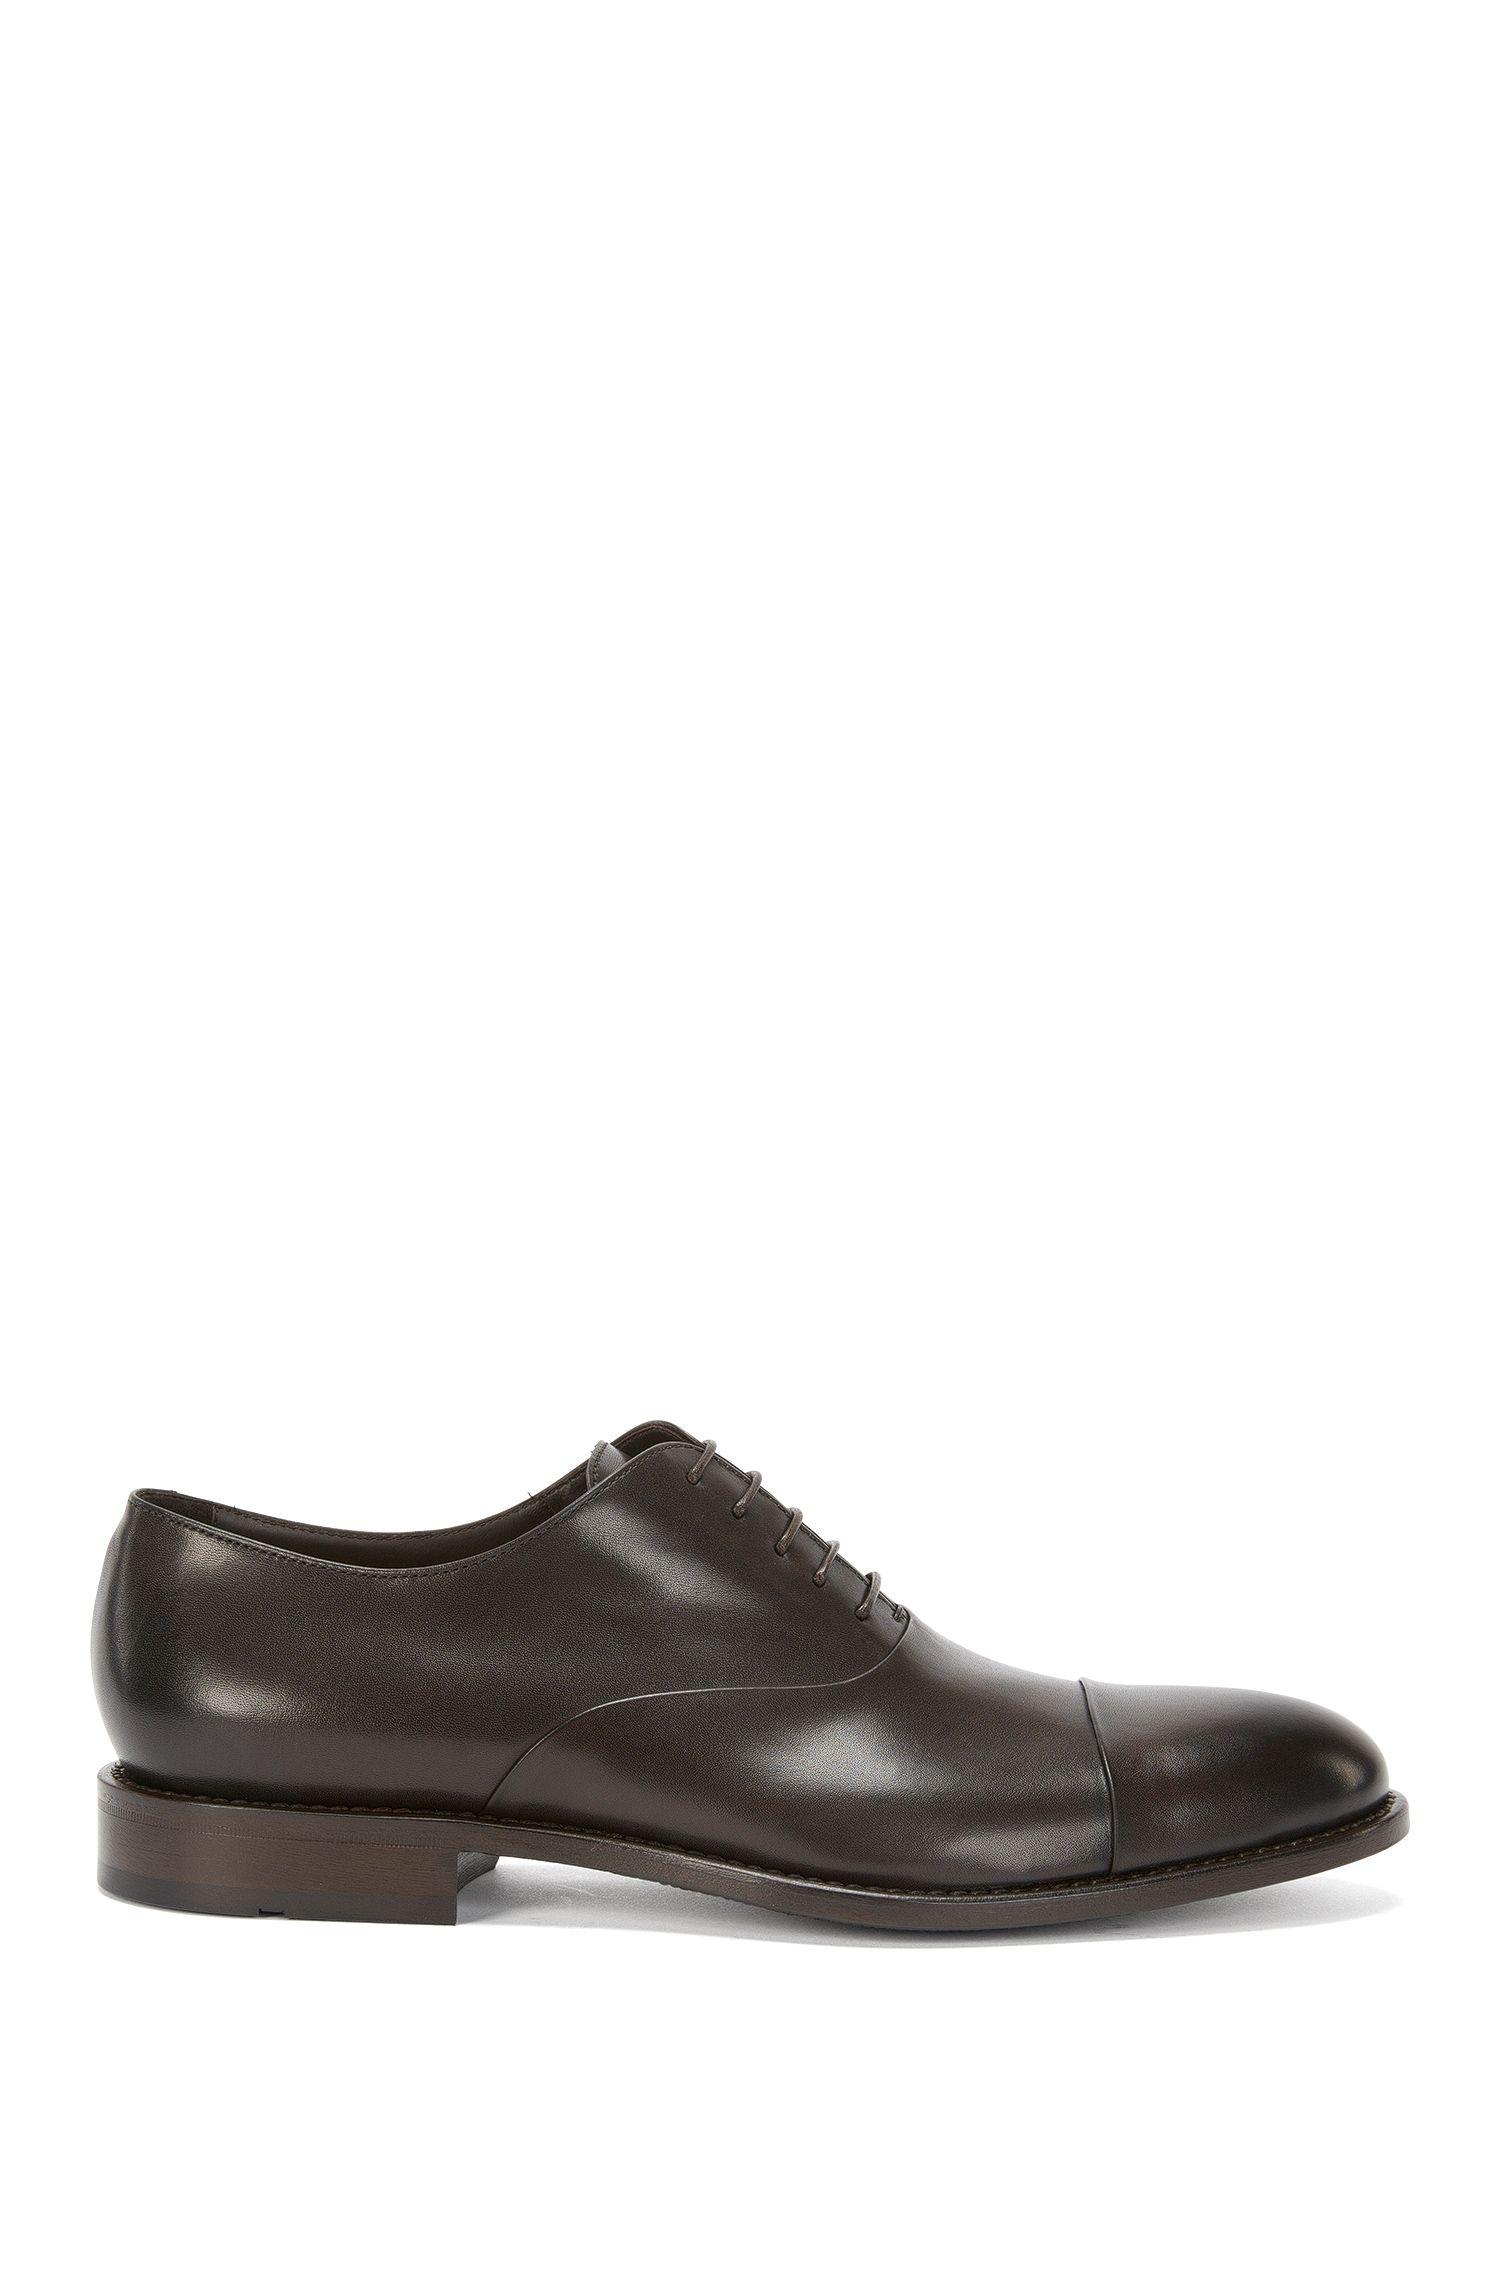 'Stockholm Oxfr Ctst' | Italian Calfskin Cape Toe Oxford Dress Shoes